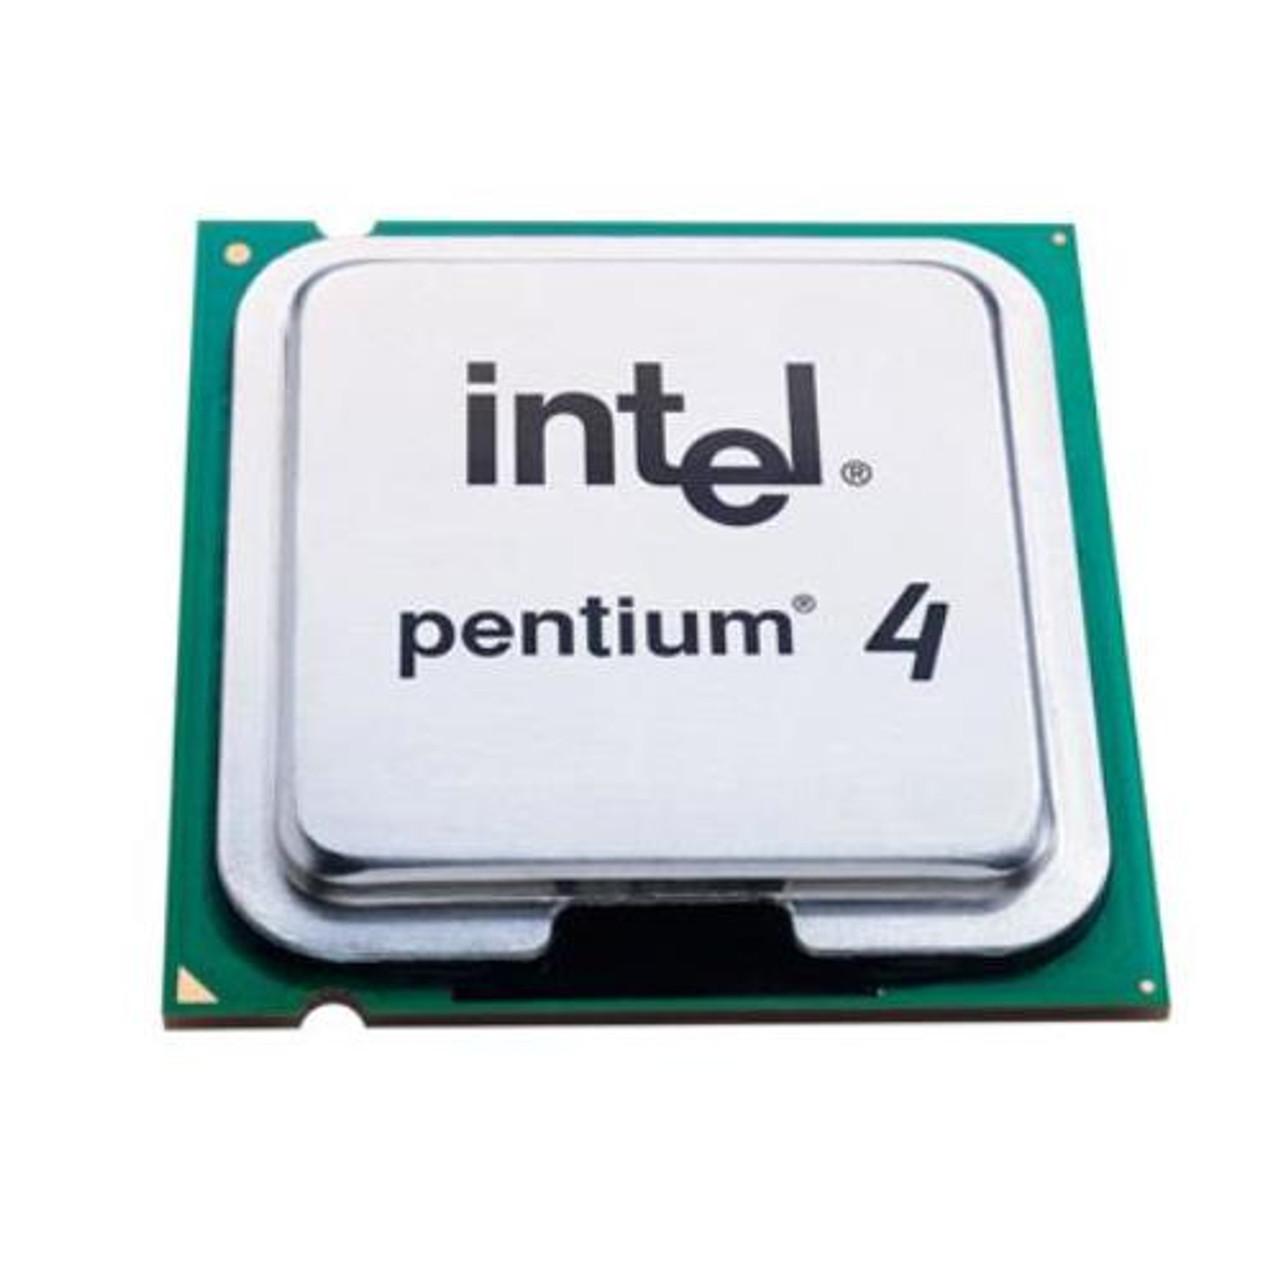 Intel LGA 775 Pentium 4 520 2.8 GHz Computer Processor BX80547PG2800E